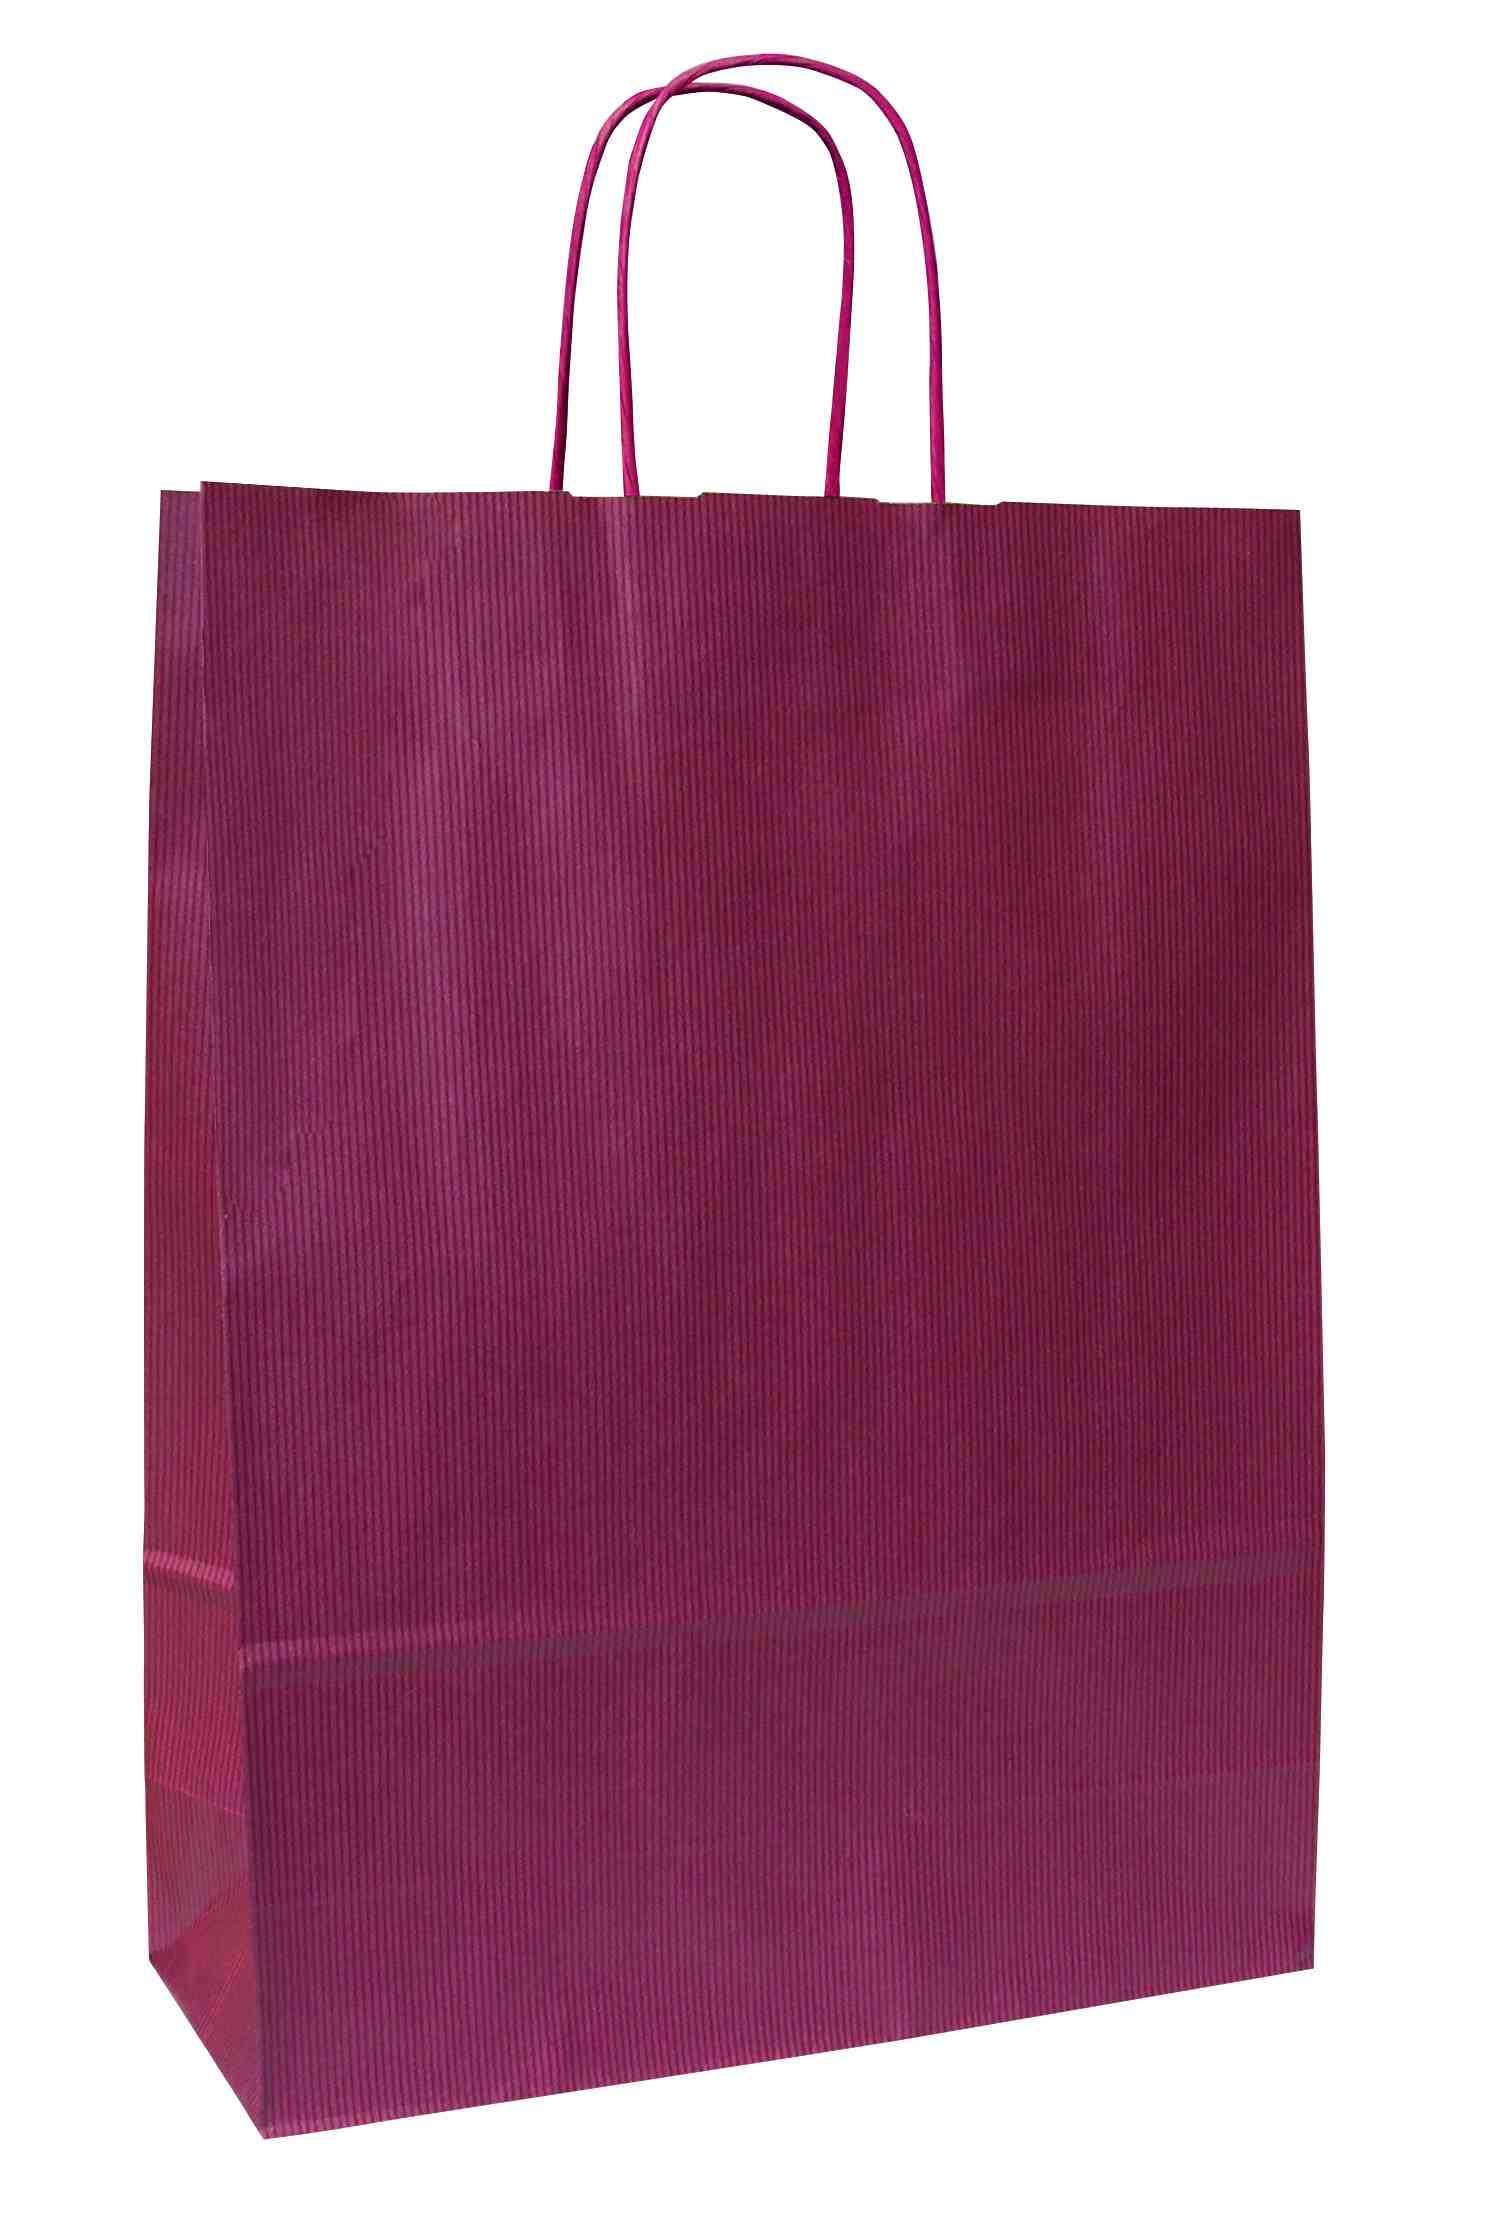 Papírové tašky o rozměru 180 x 80 x 250 mm,vínové, kr. pap. držadlo.